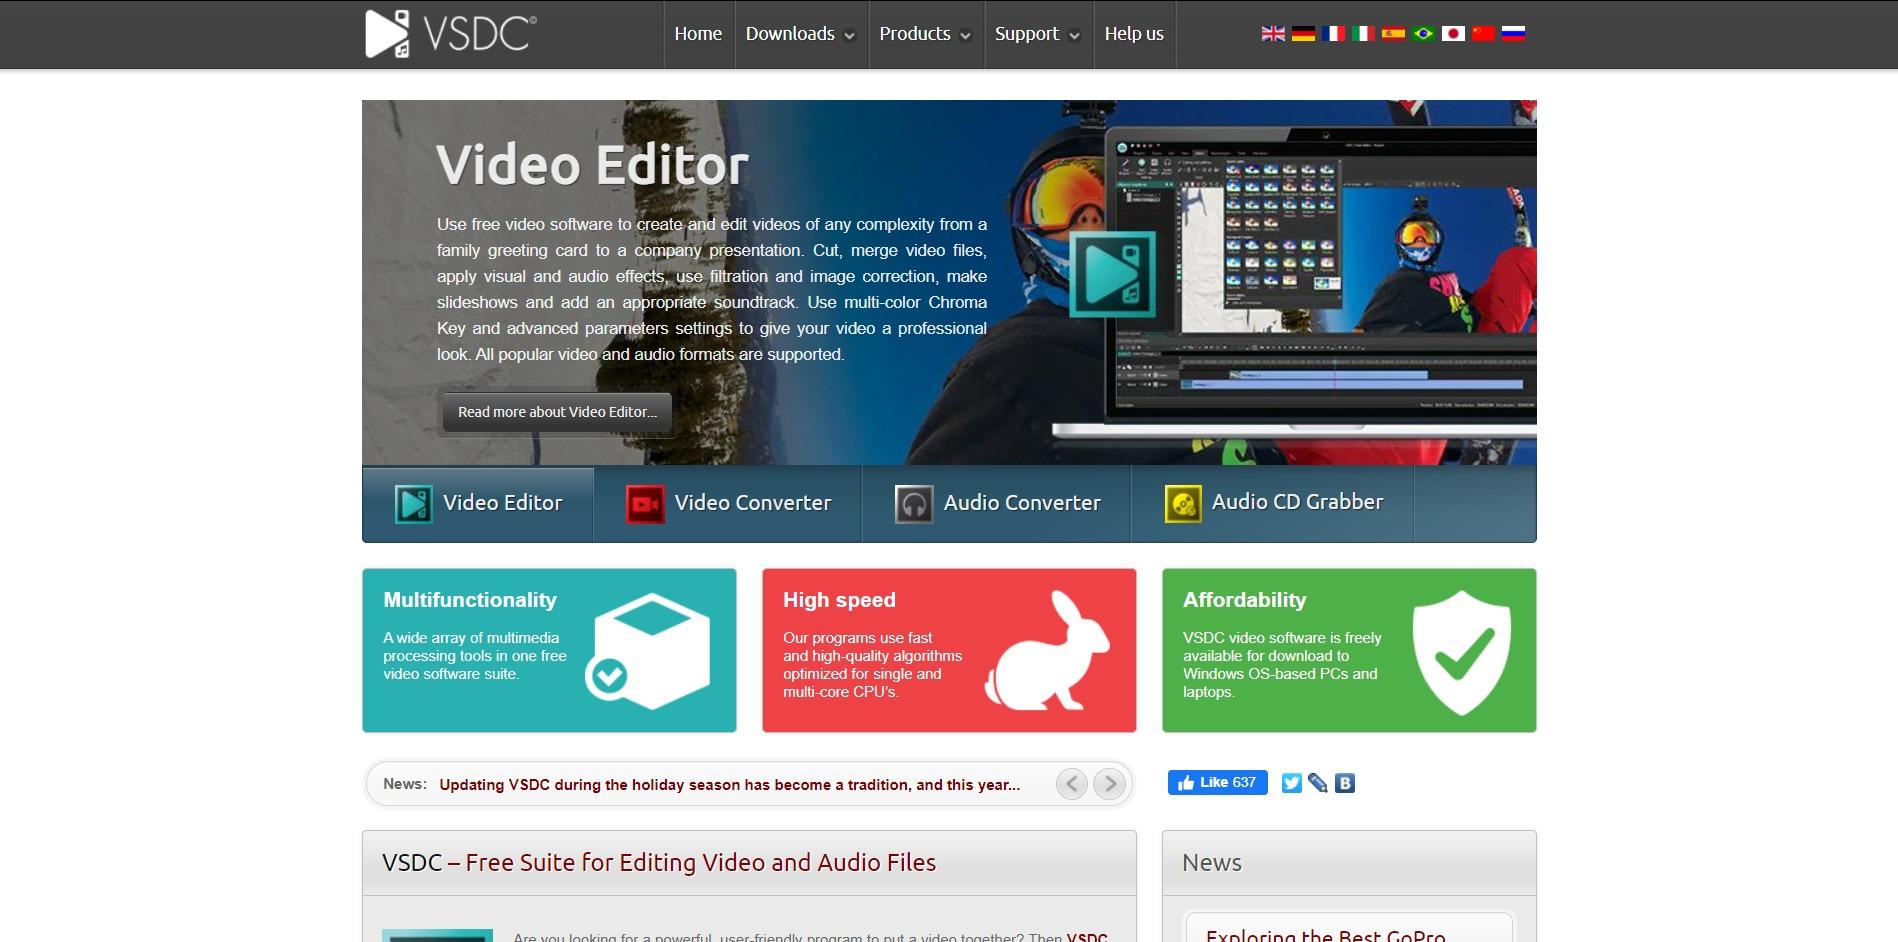 VSDC Free Video Editor - Main Page